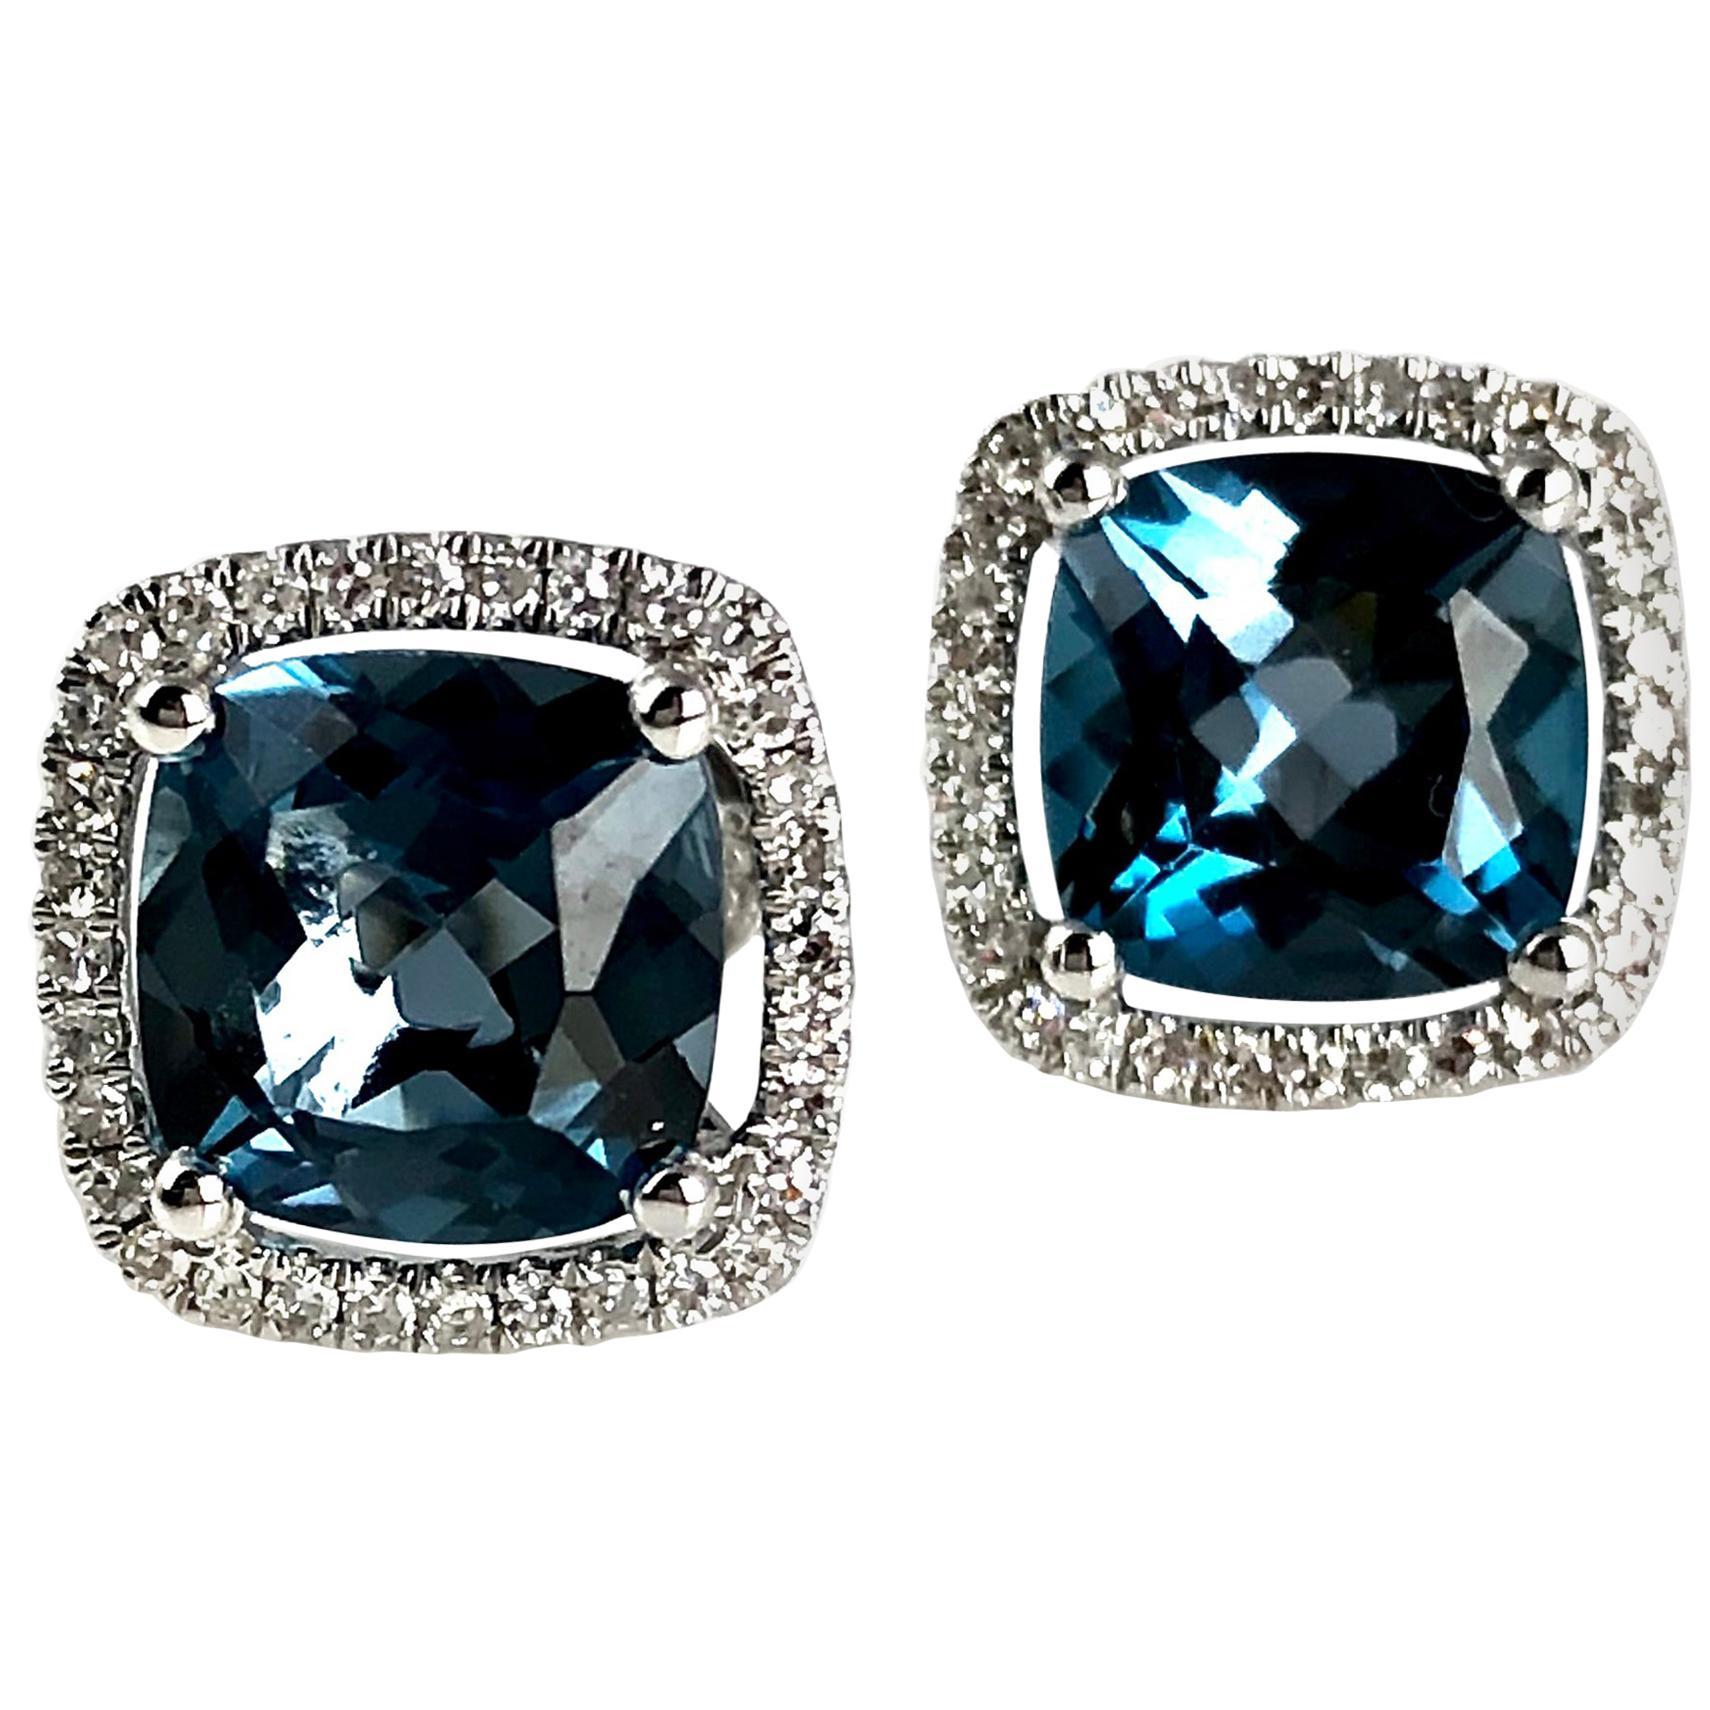 DiamondTown 3.73 Carat London Blue Topaz Halo Stud Earrings in 14 Karat Gold